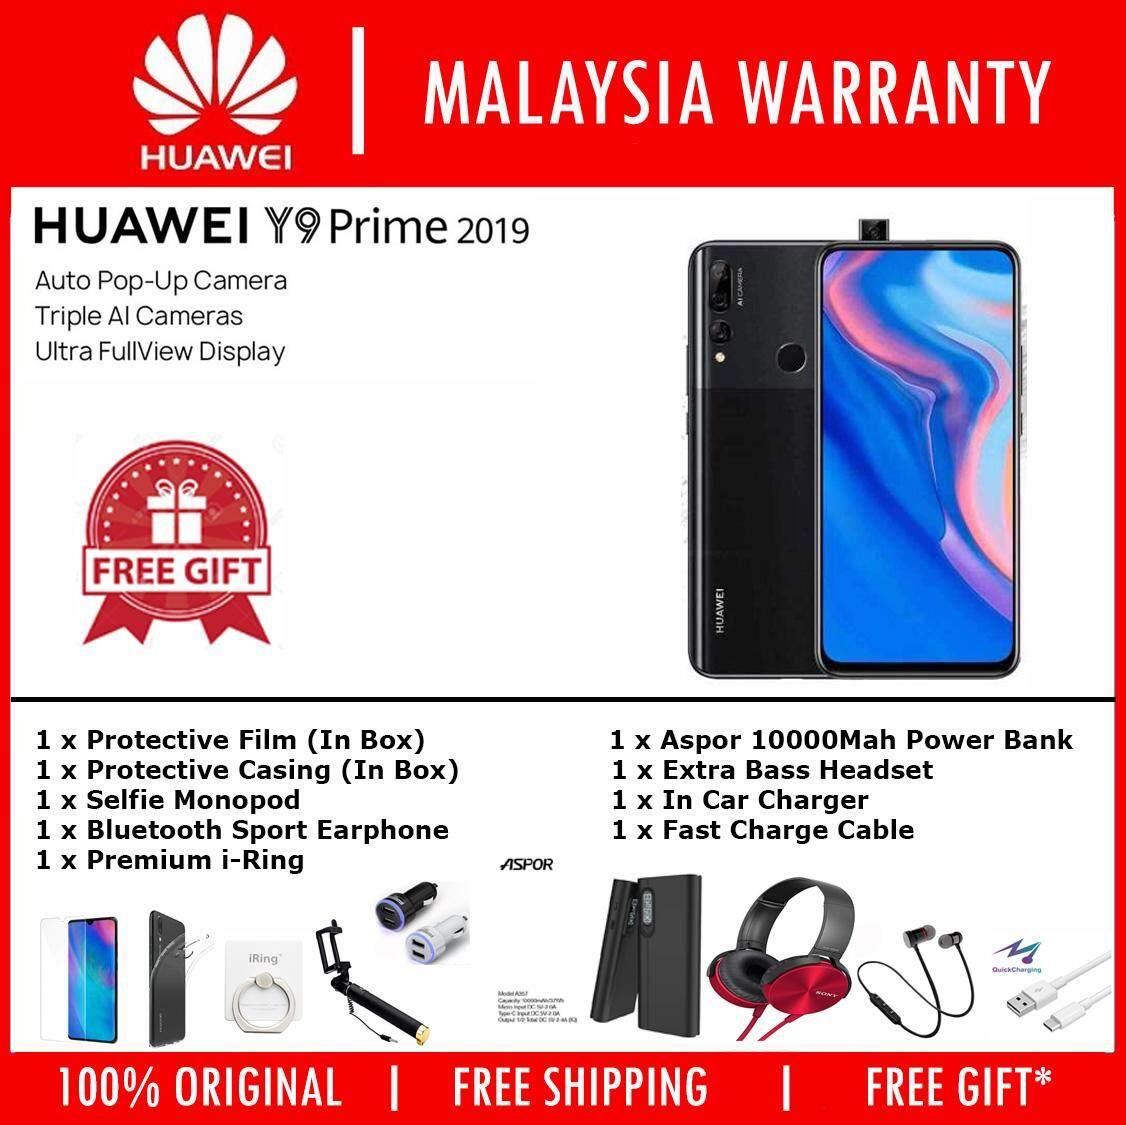 [ Free Gift ] Huawei Y9 Prime 2019 Handphone ( 4GB + 128GB ) 1 Year Warranty By Huawei Malaysia